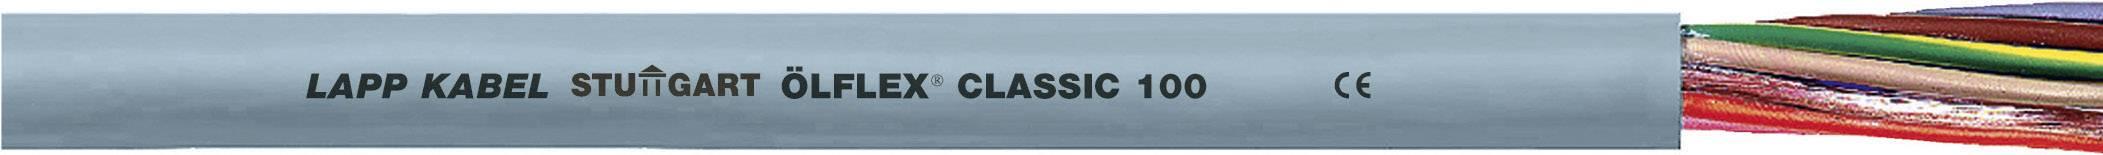 Kabel LappKabel Ölflex CLASSIC 100 10G0,5 (0010007), PVC, 8,6 mm, 500 V, šedá, 100 m